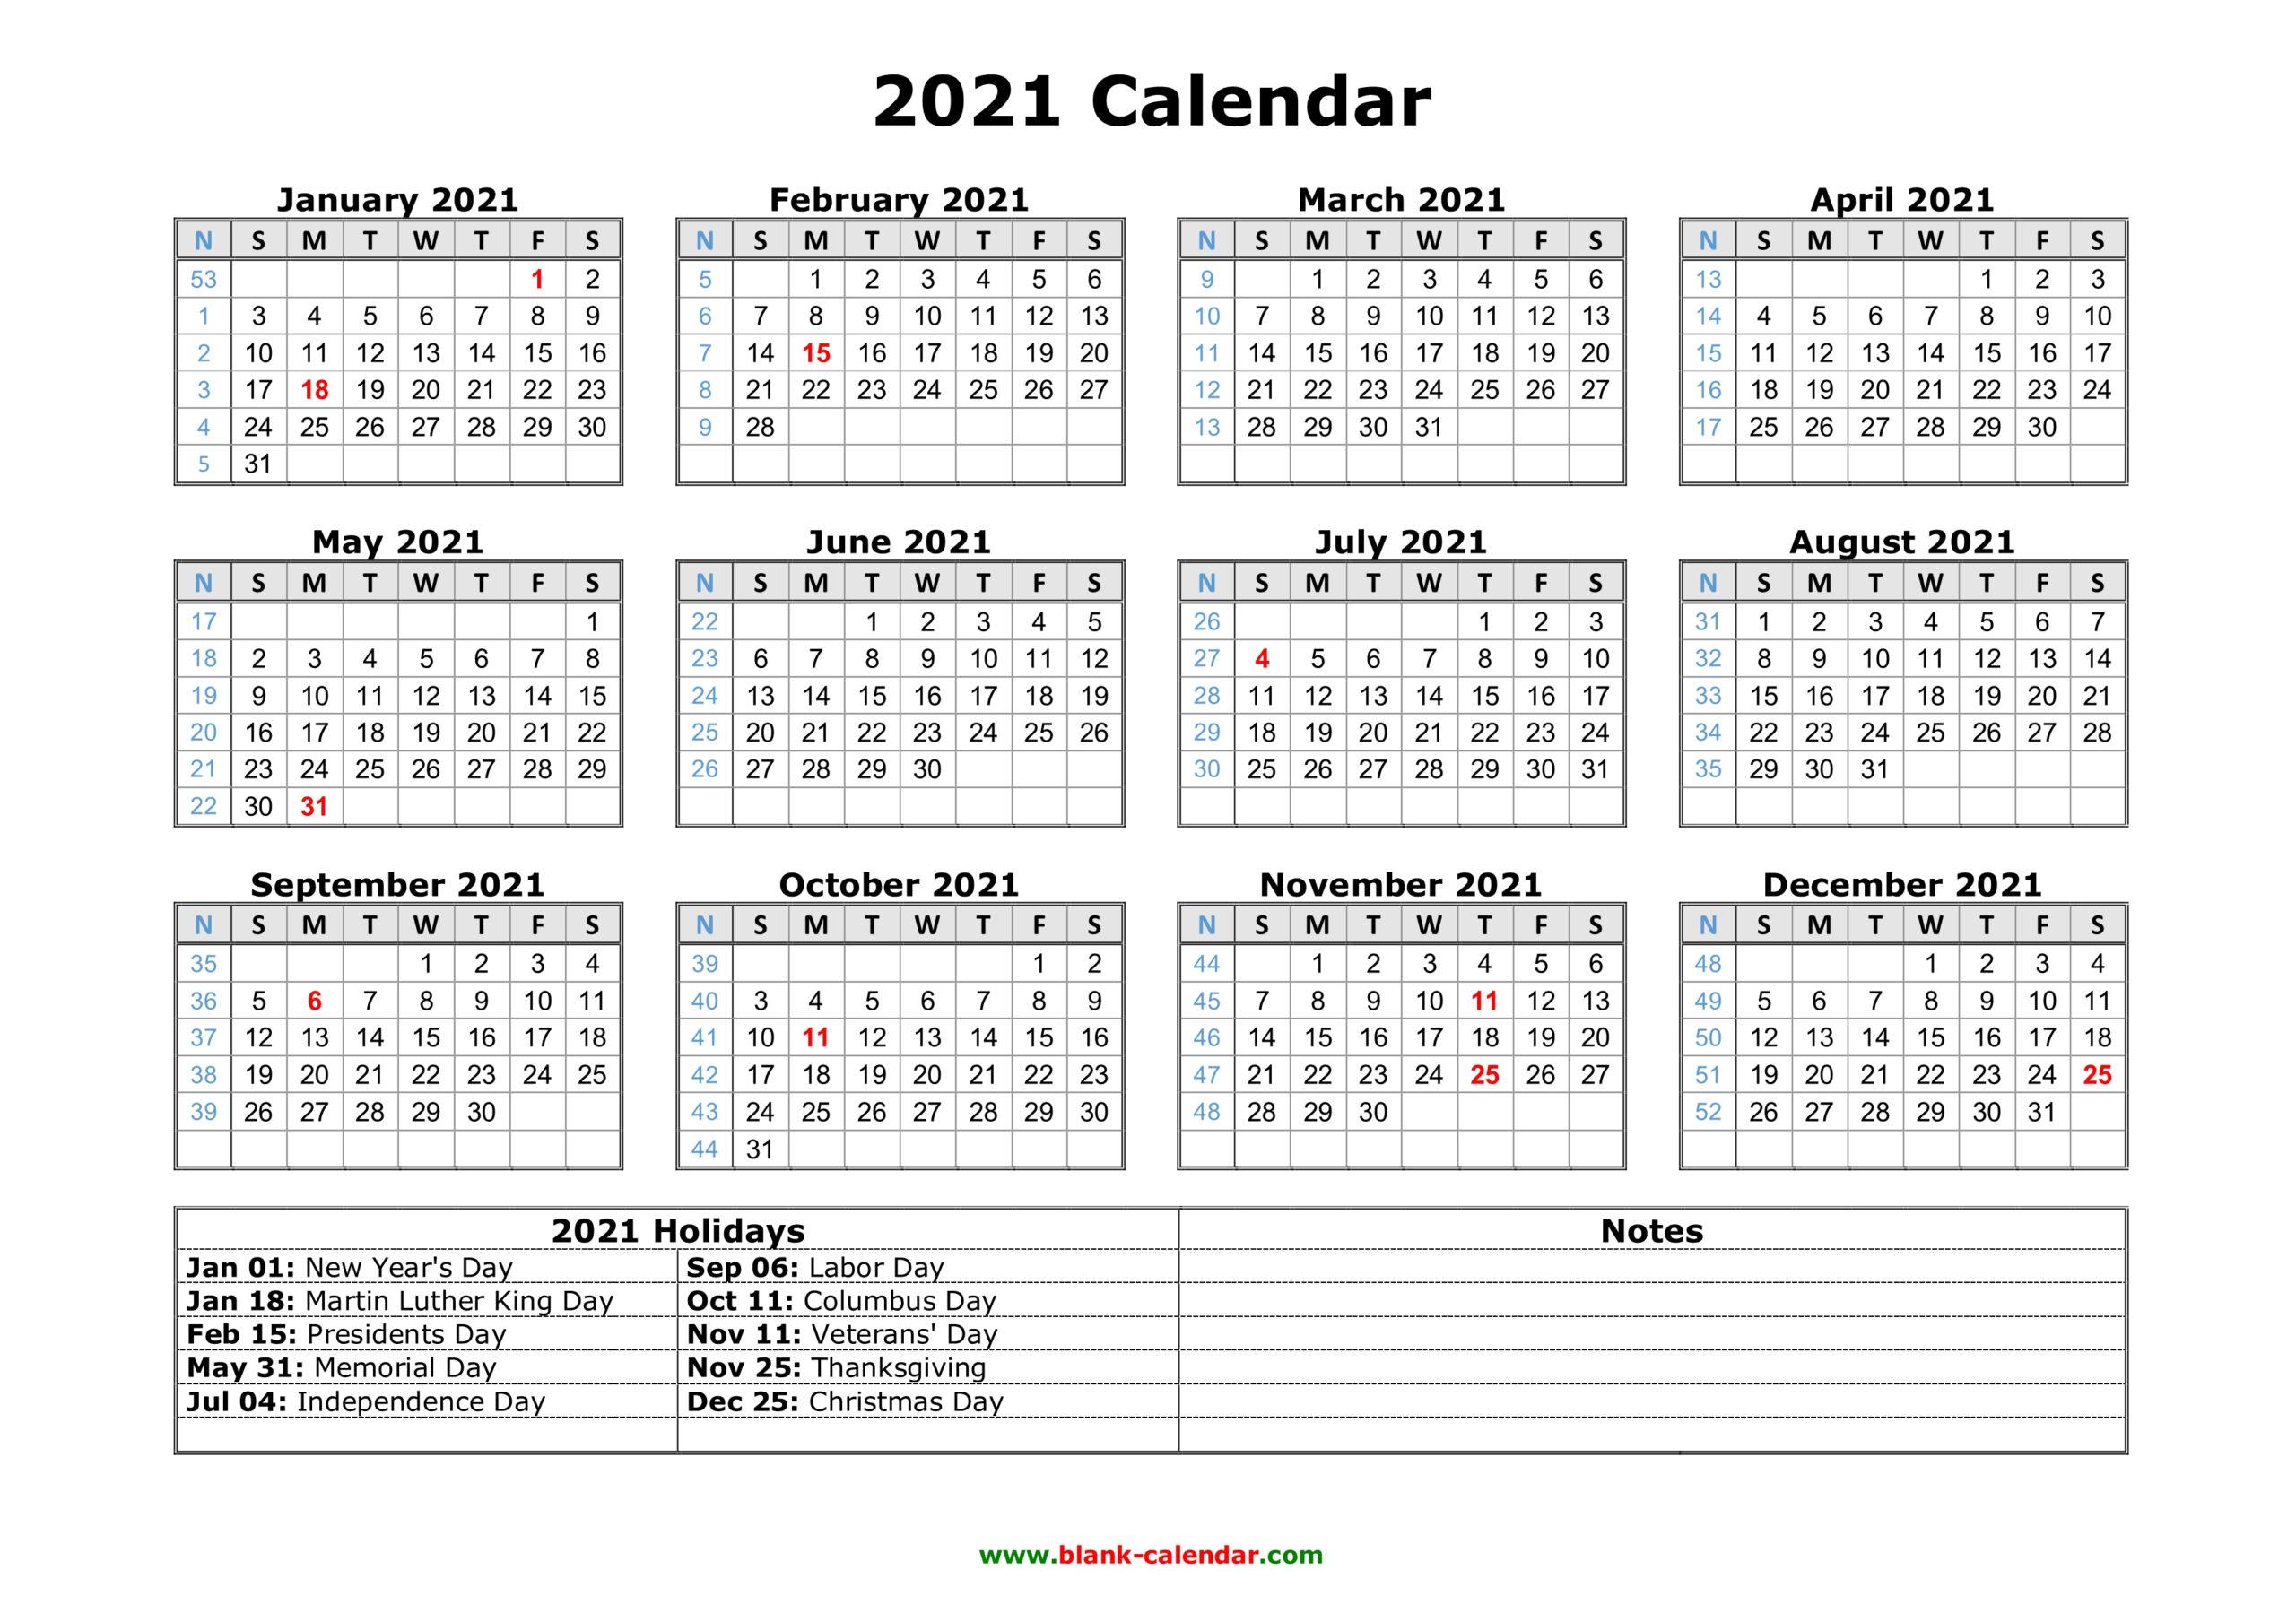 Walmart Fiscal Year 2021 Calendar